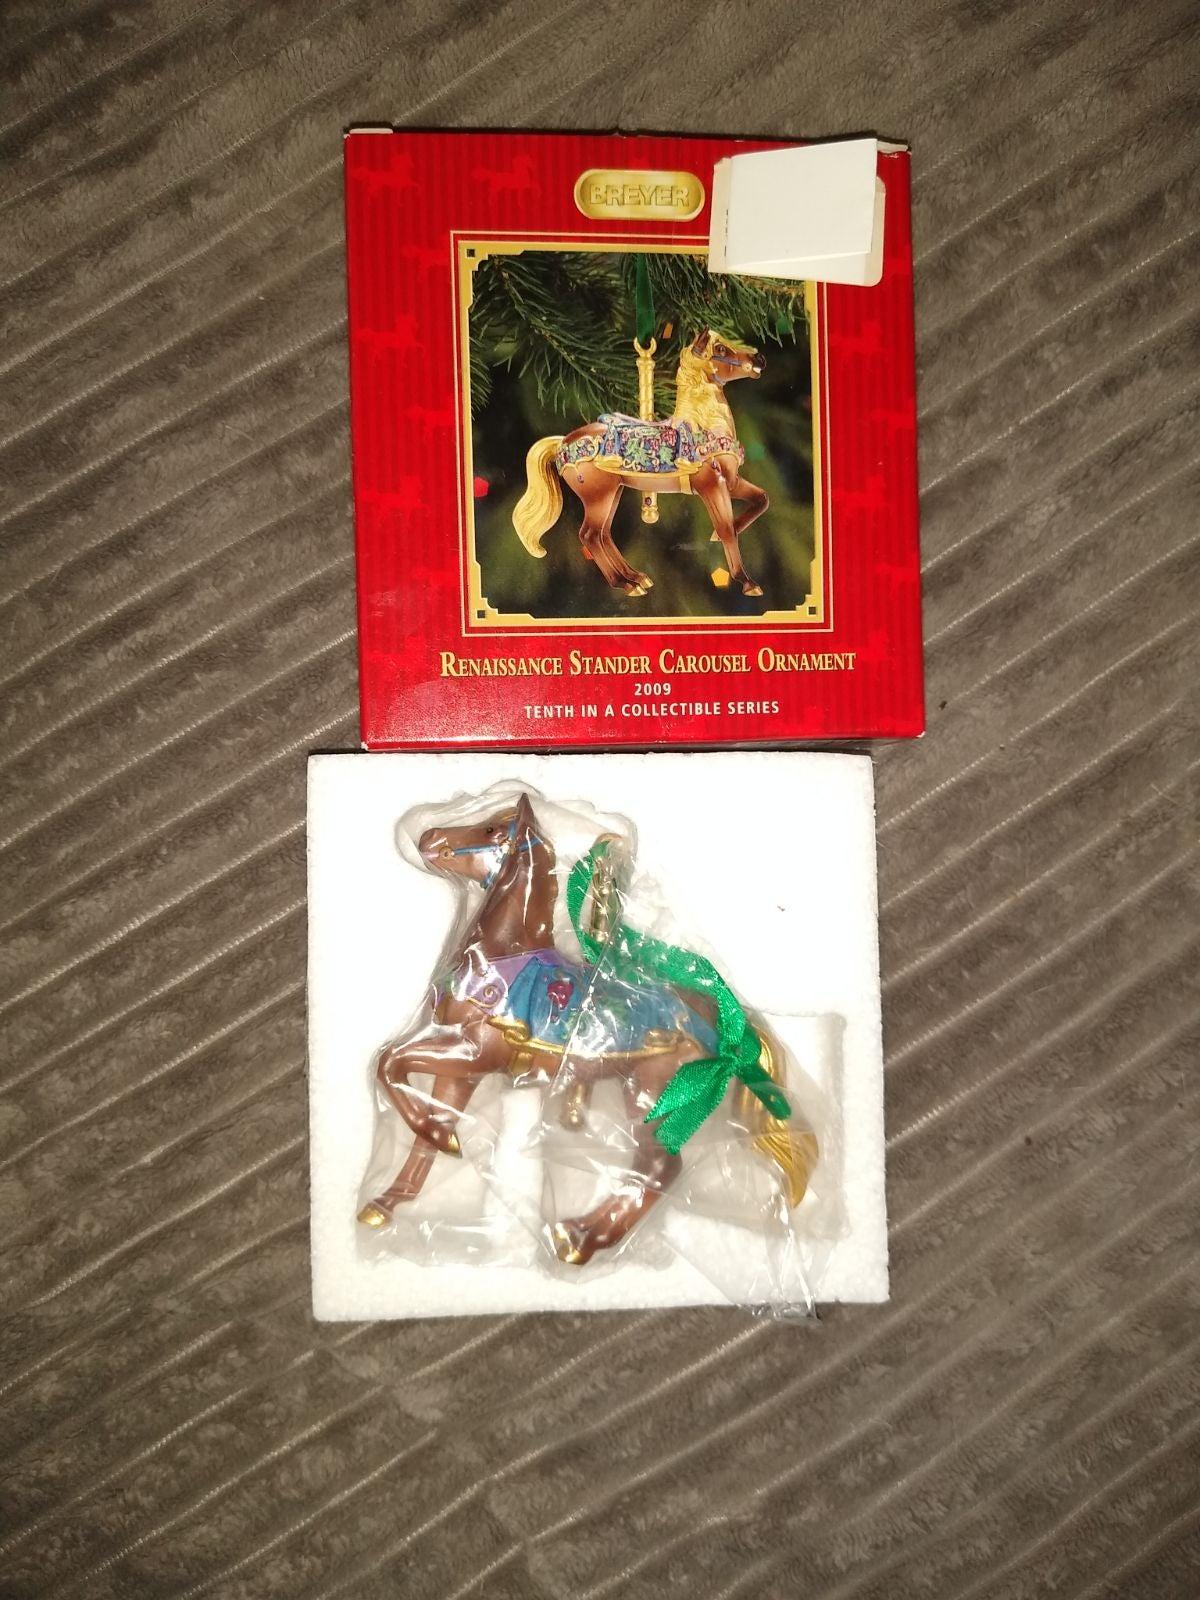 2009 Breyer Carousel Horse Ornament